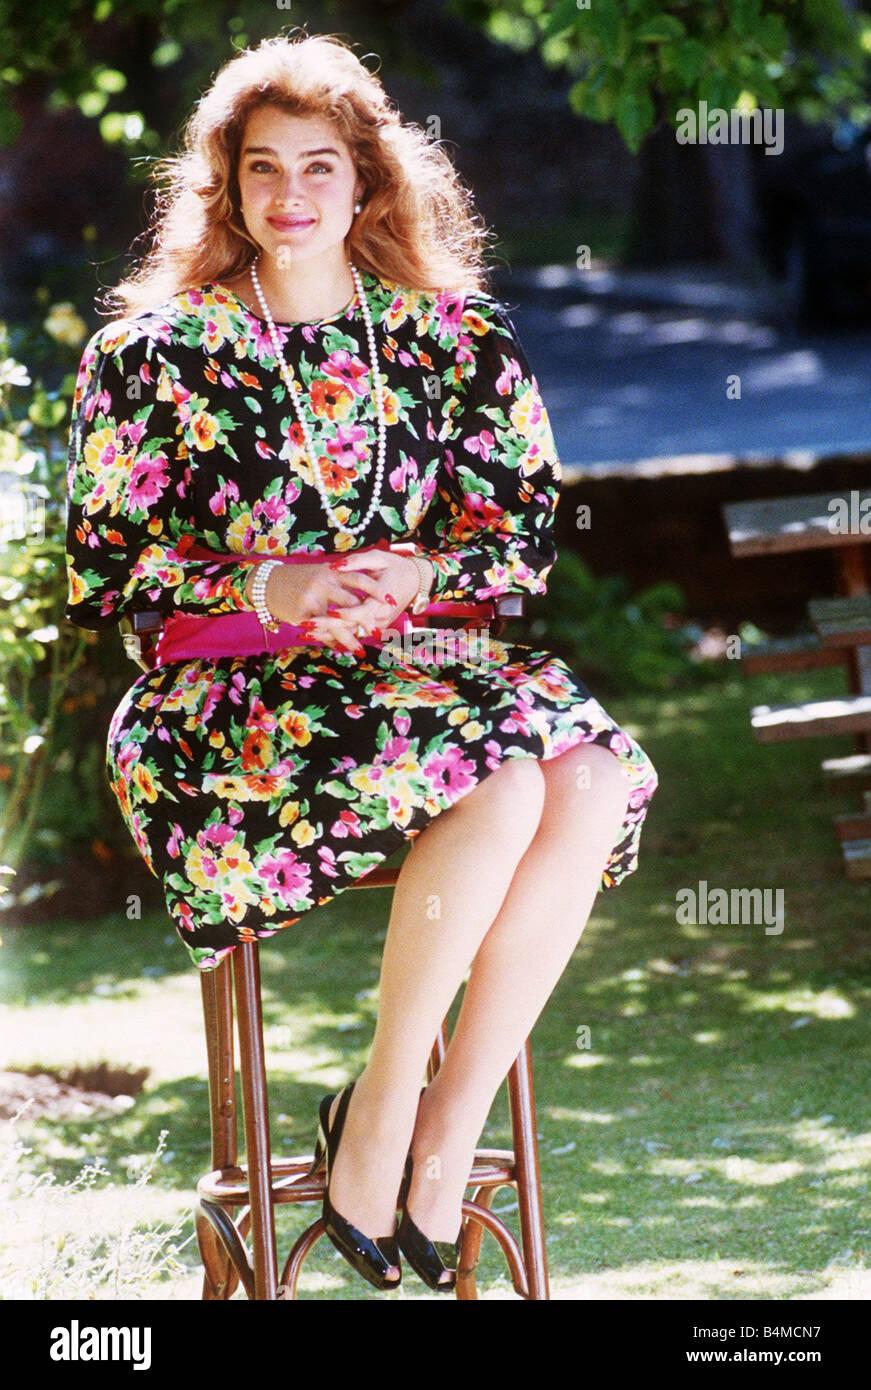 Brooke Shields Actress In June 1988 Mirrorpix Stock Photo